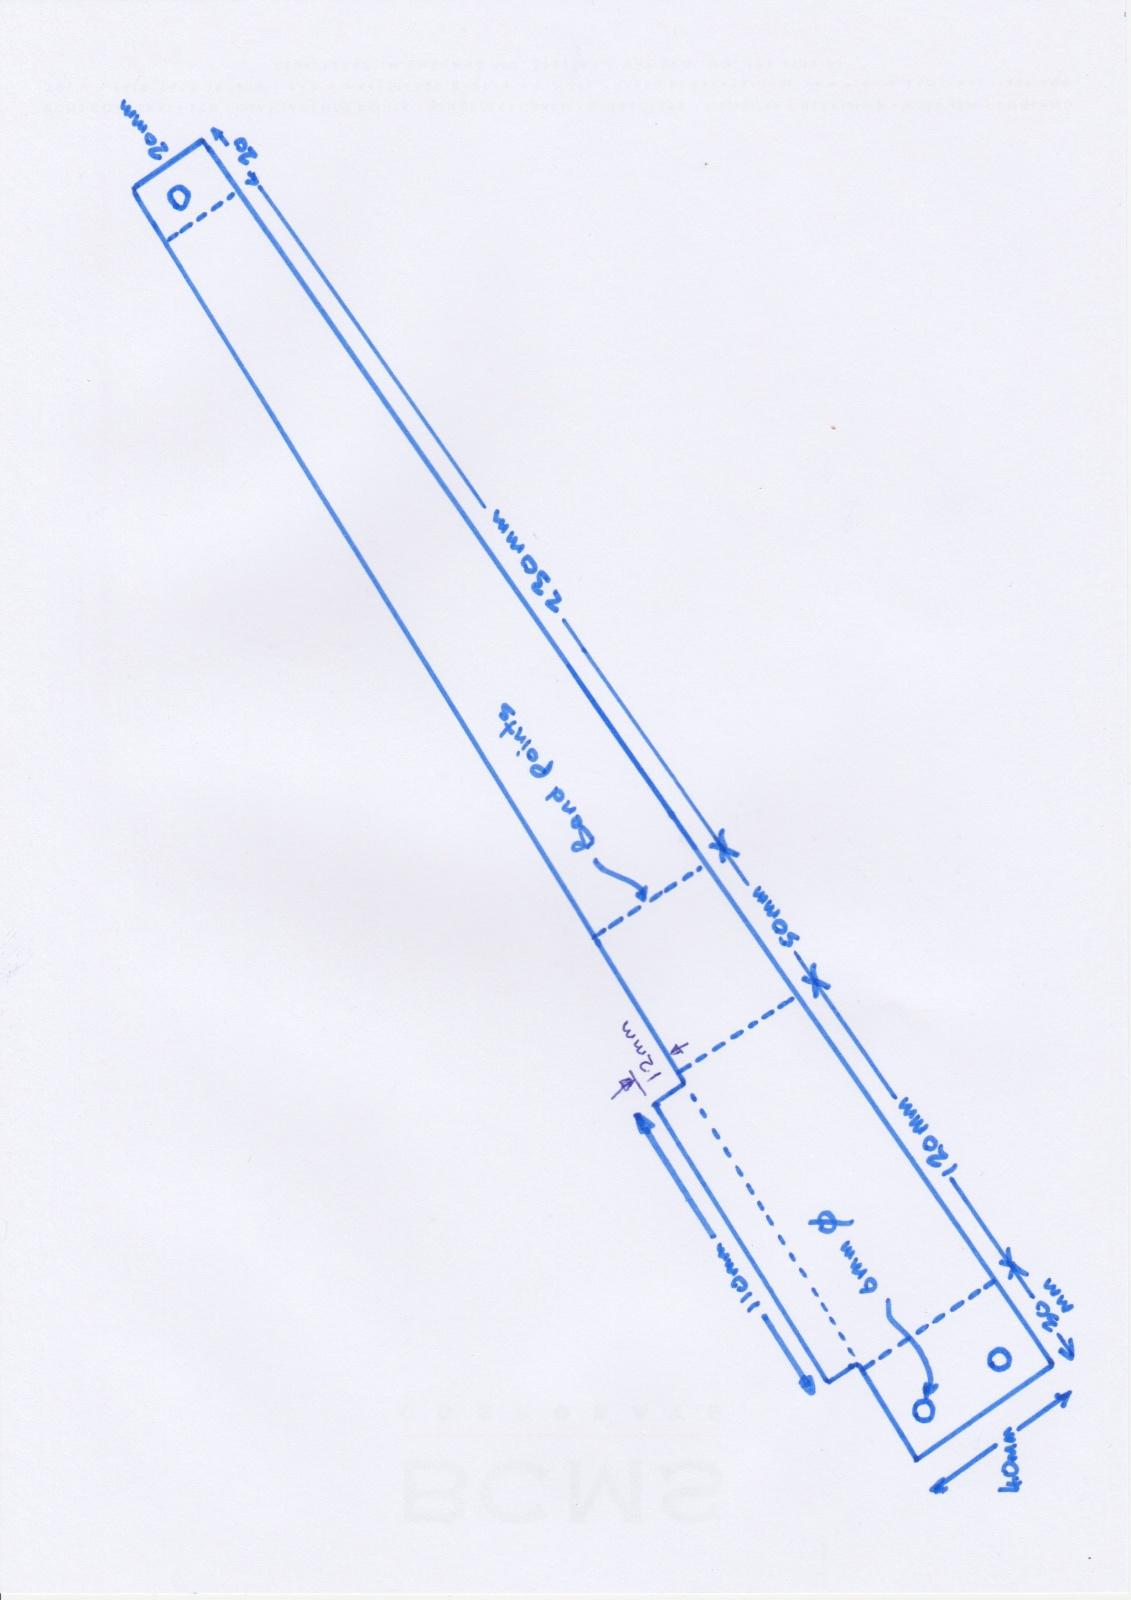 Click image for larger version  Name:MastSteps.jpg Views:35 Size:332.8 KB ID:164750